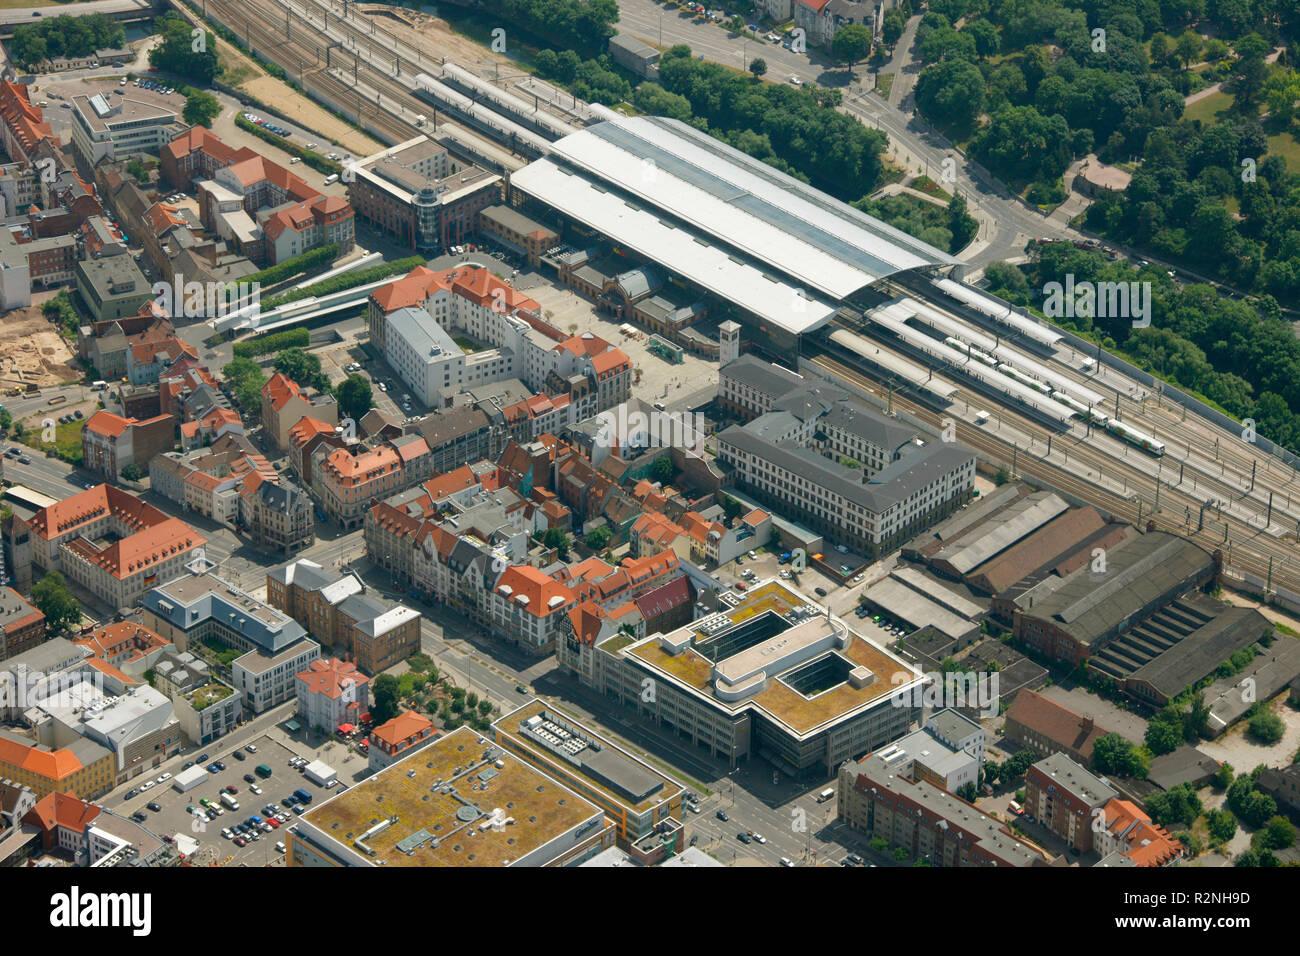 Aerial view, Erfurt central station, aerial view, Richard-Breslau-Straße, Erfurt, Thuringia, Germany, Europe, - Stock Image